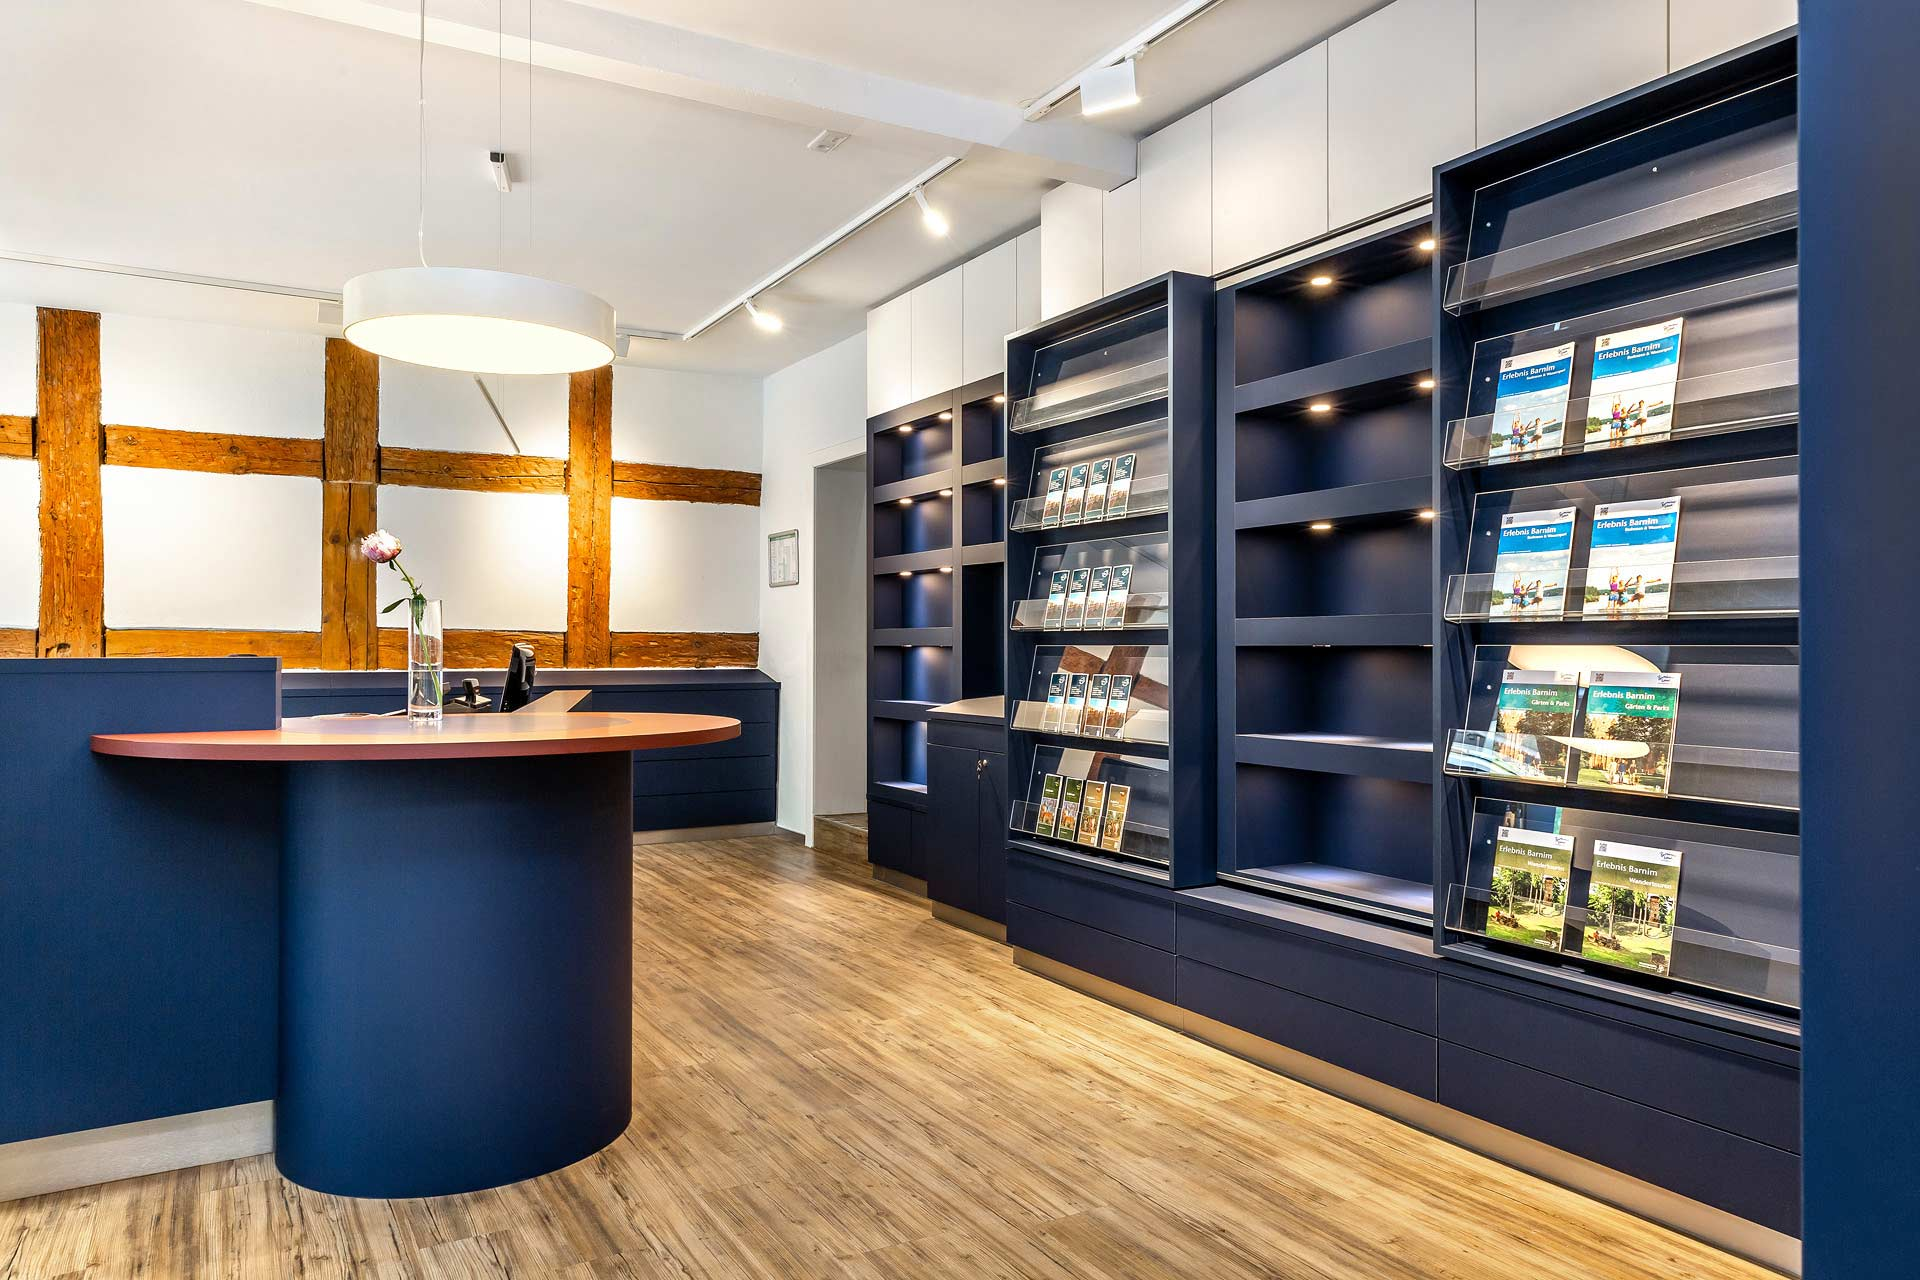 interior-fotografie-store-shop-reisebuero